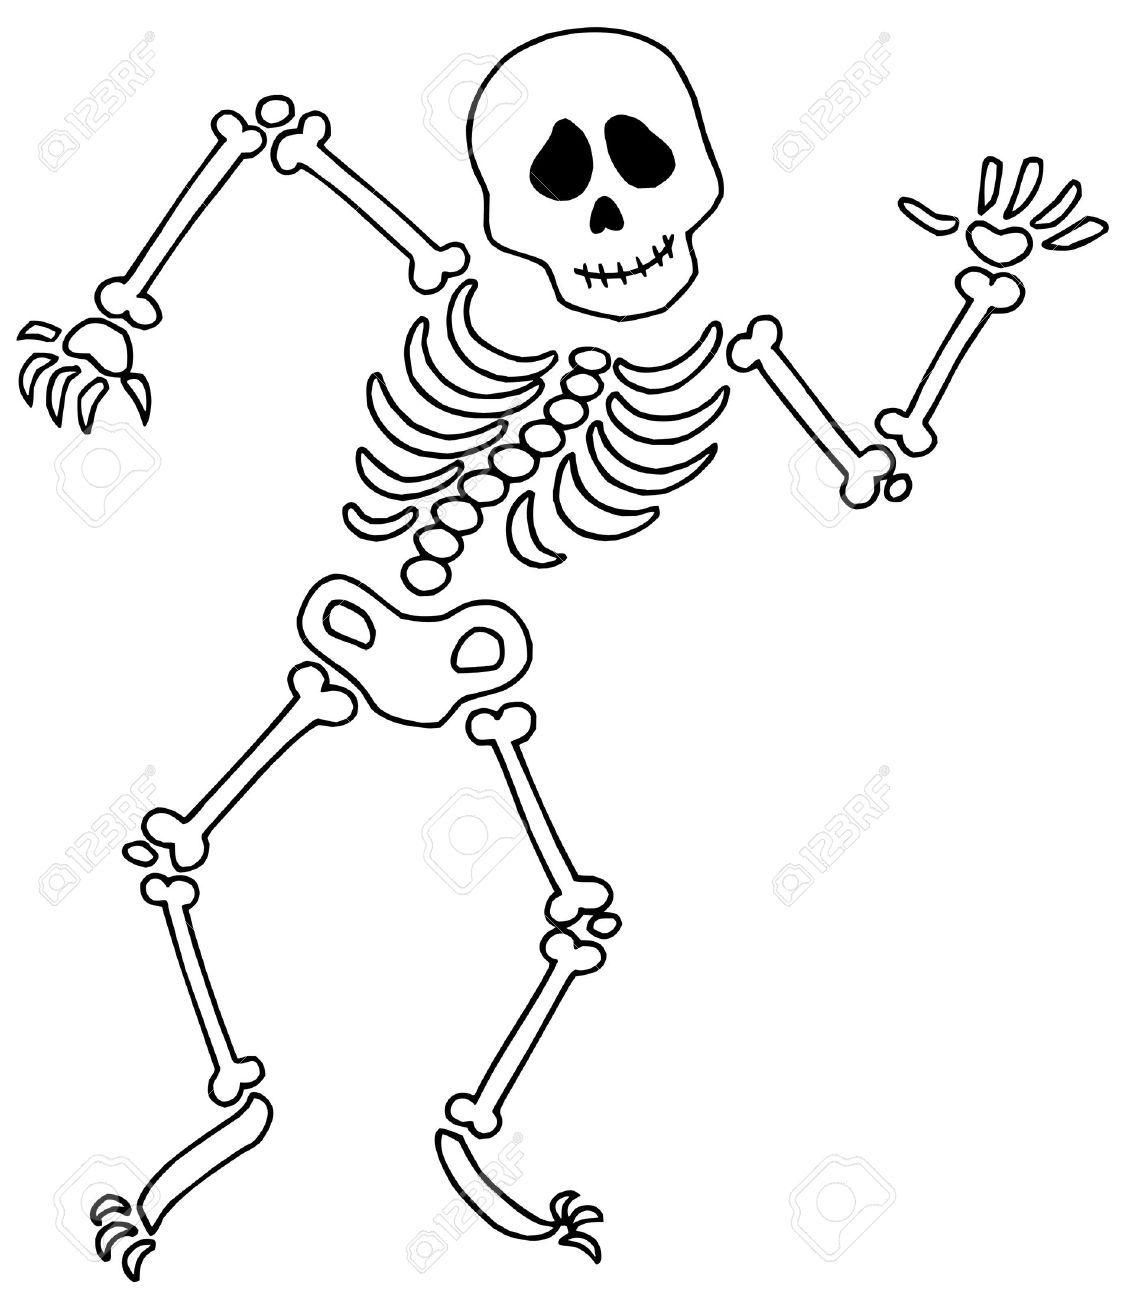 Happy skeleton clipart clip art free stock Happy skeleton clipart 4 » Clipart Portal clip art free stock